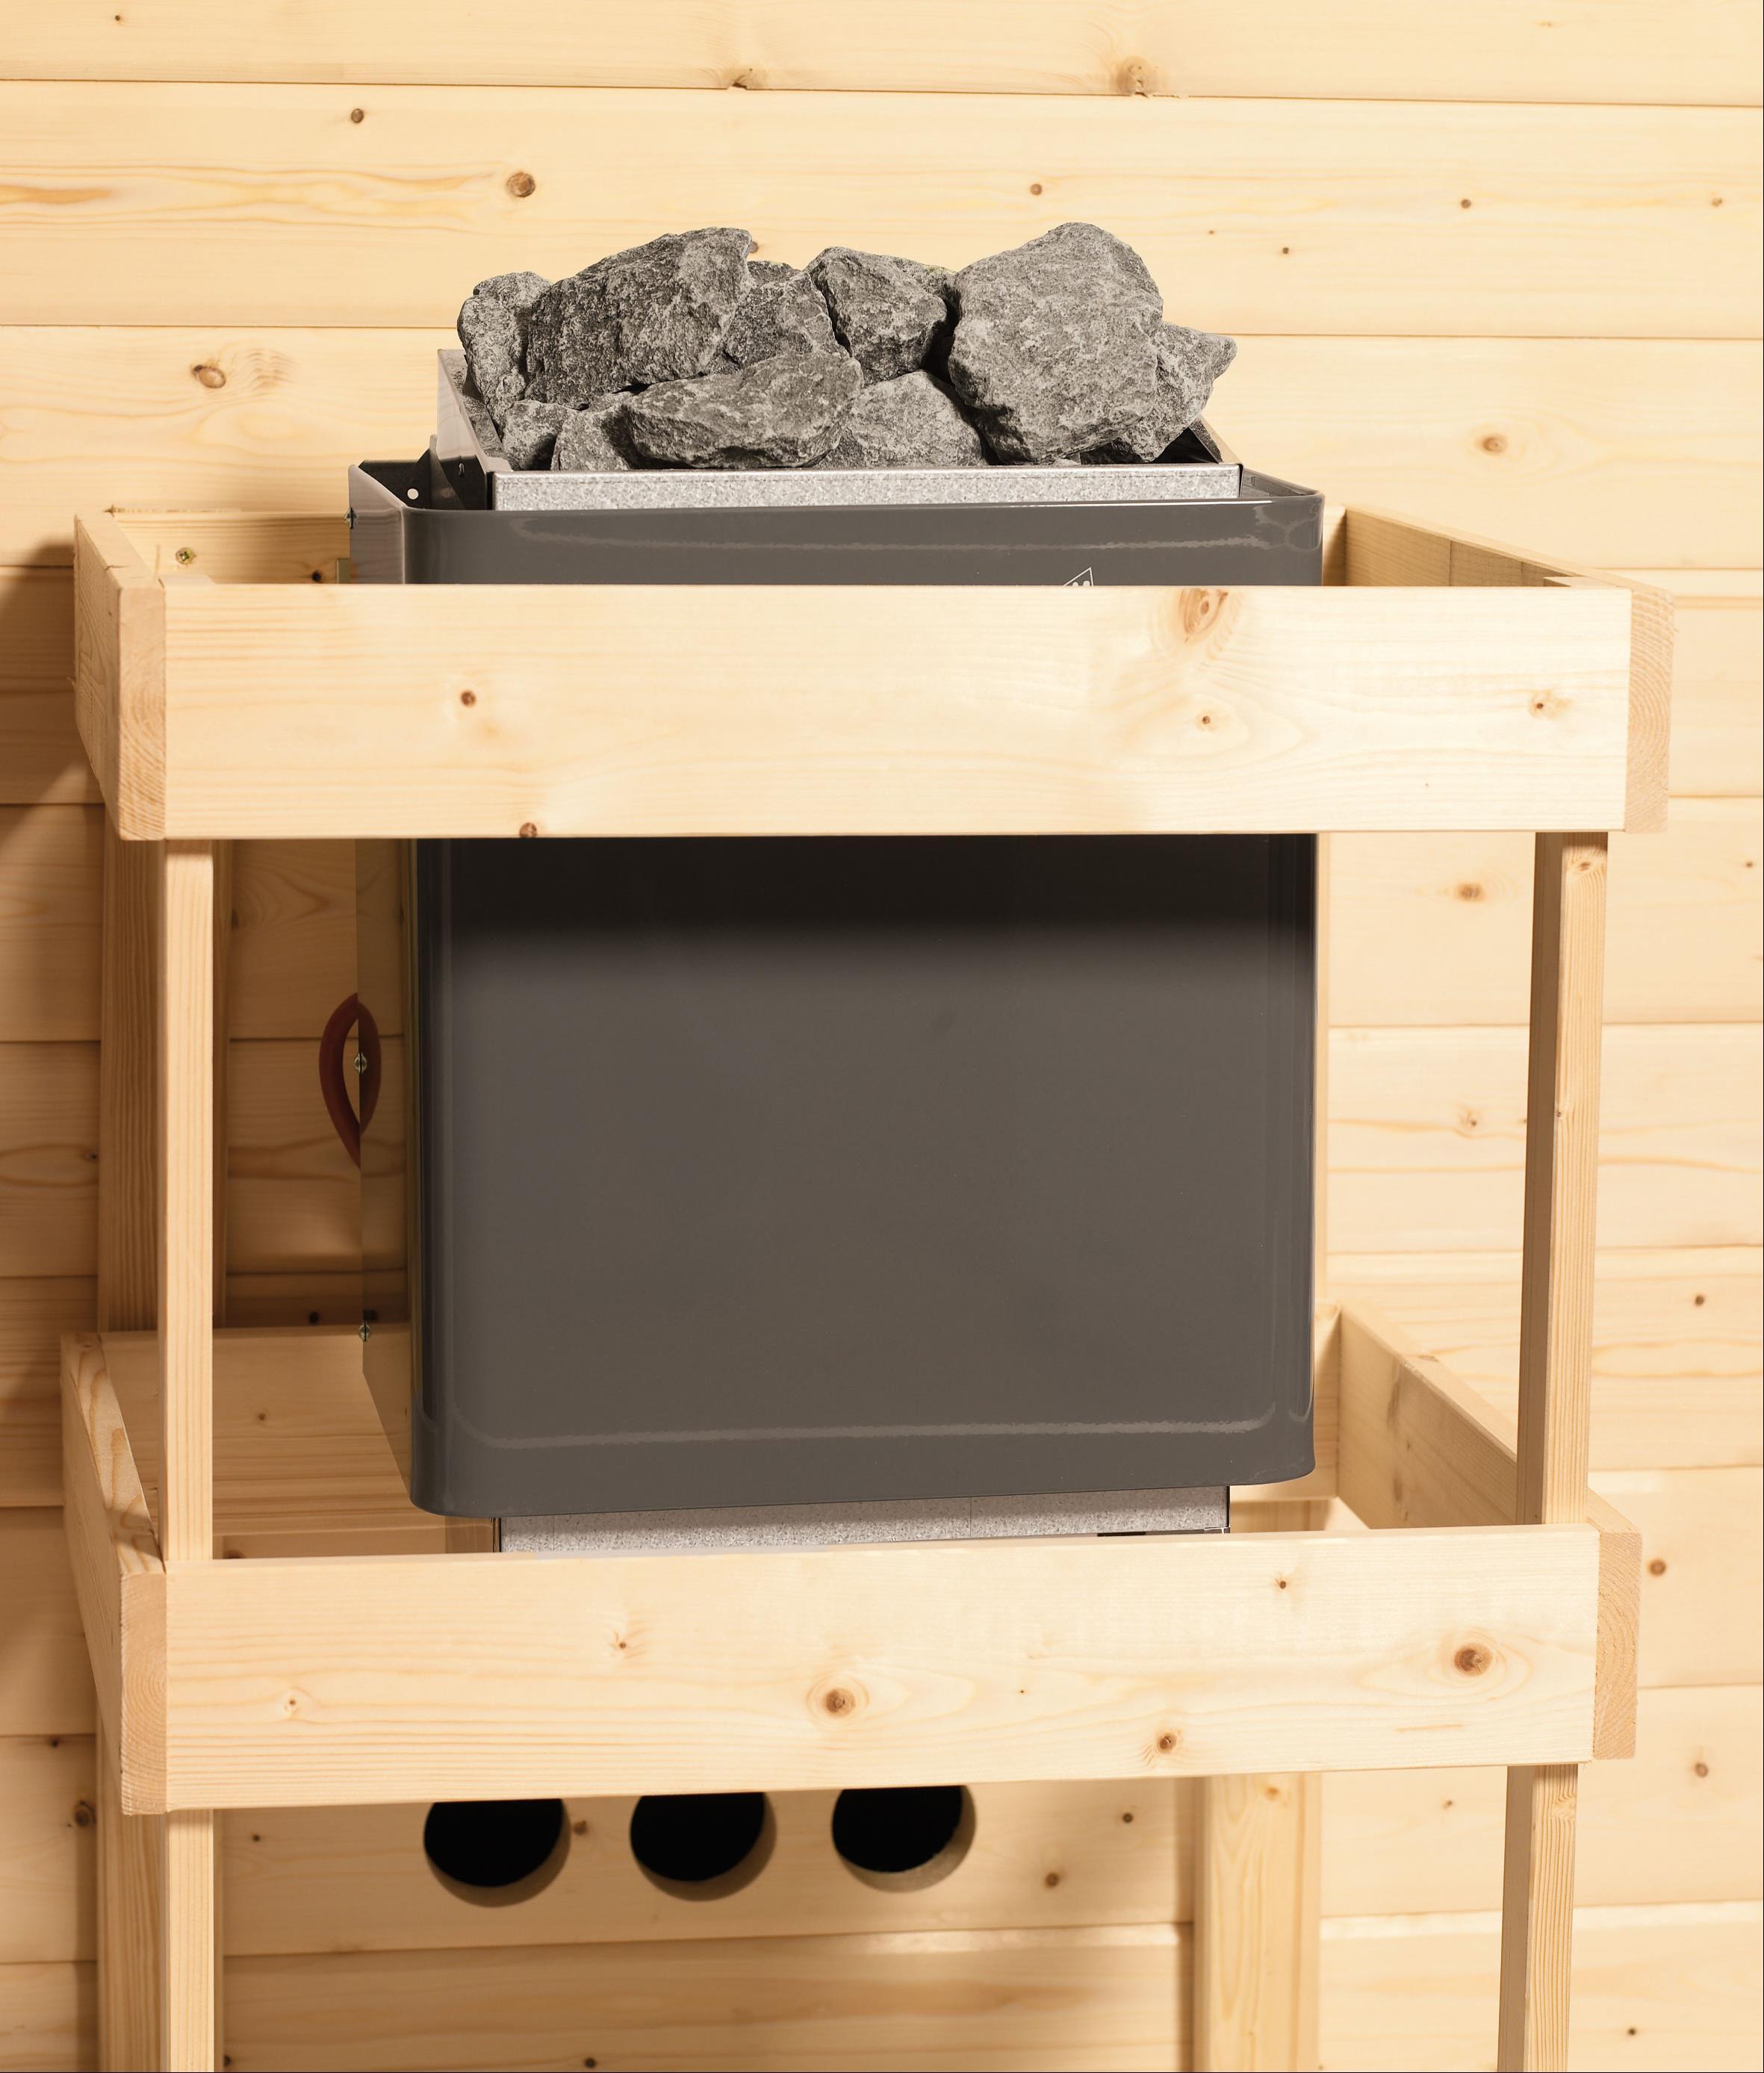 Woodfeeling Sauna Franka 38mm Saunaofen 9kW ext. Dachkranz Classic Tür Bild 9